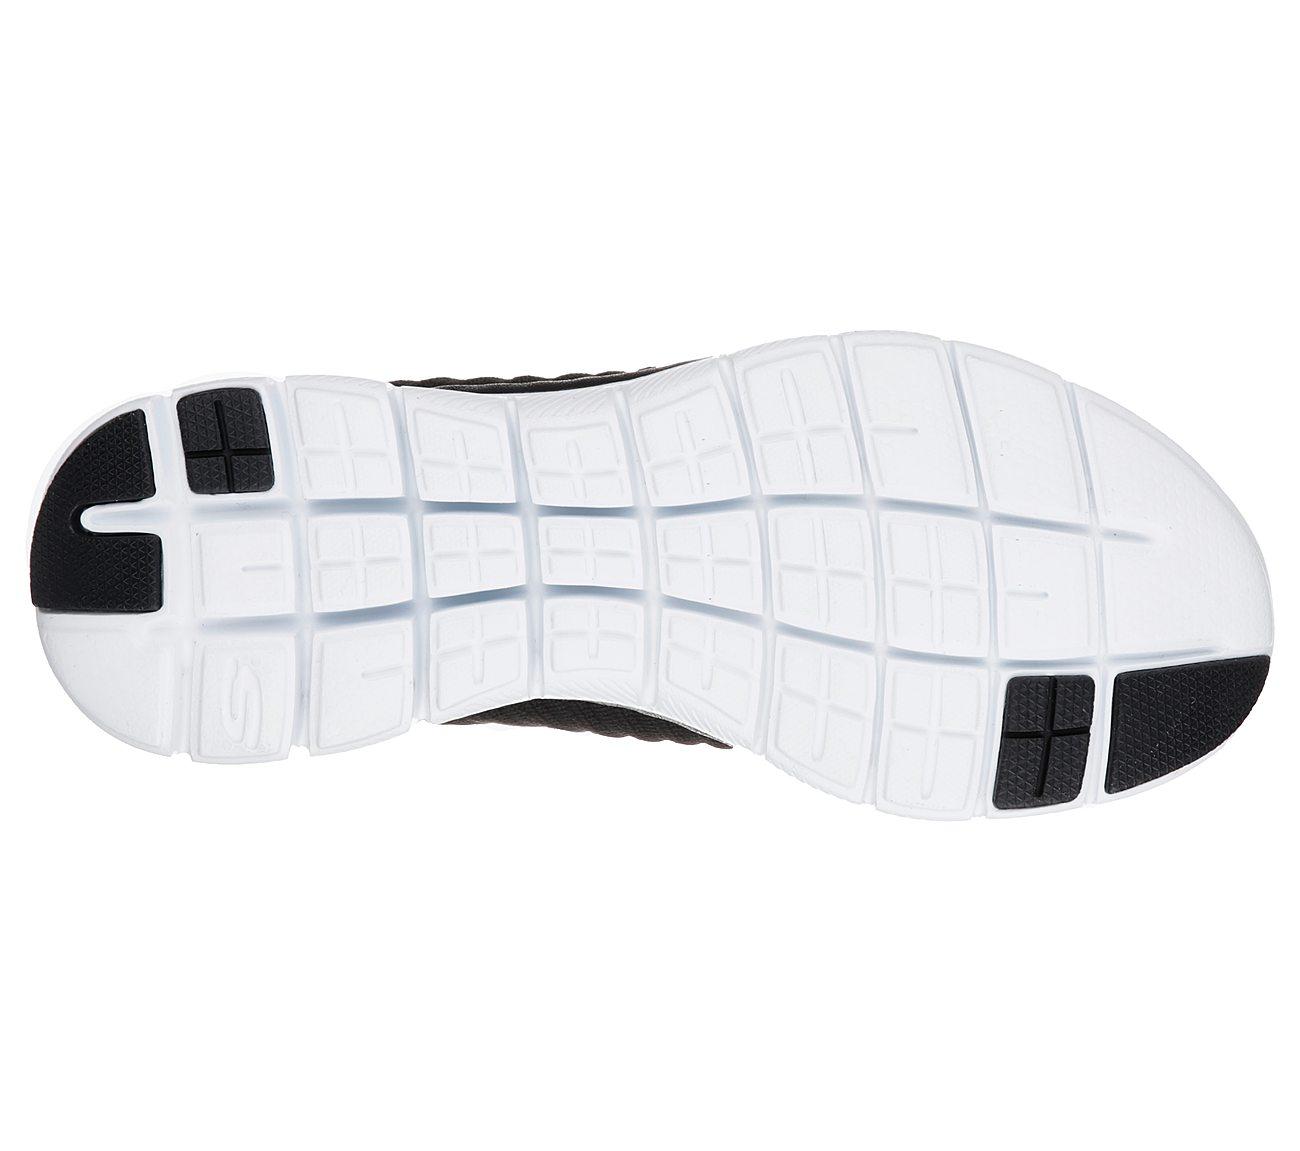 bd38029f44e Buy SKECHERS Flex Appeal 2.0 - Estates Flex Appeal Shoes only £64.00